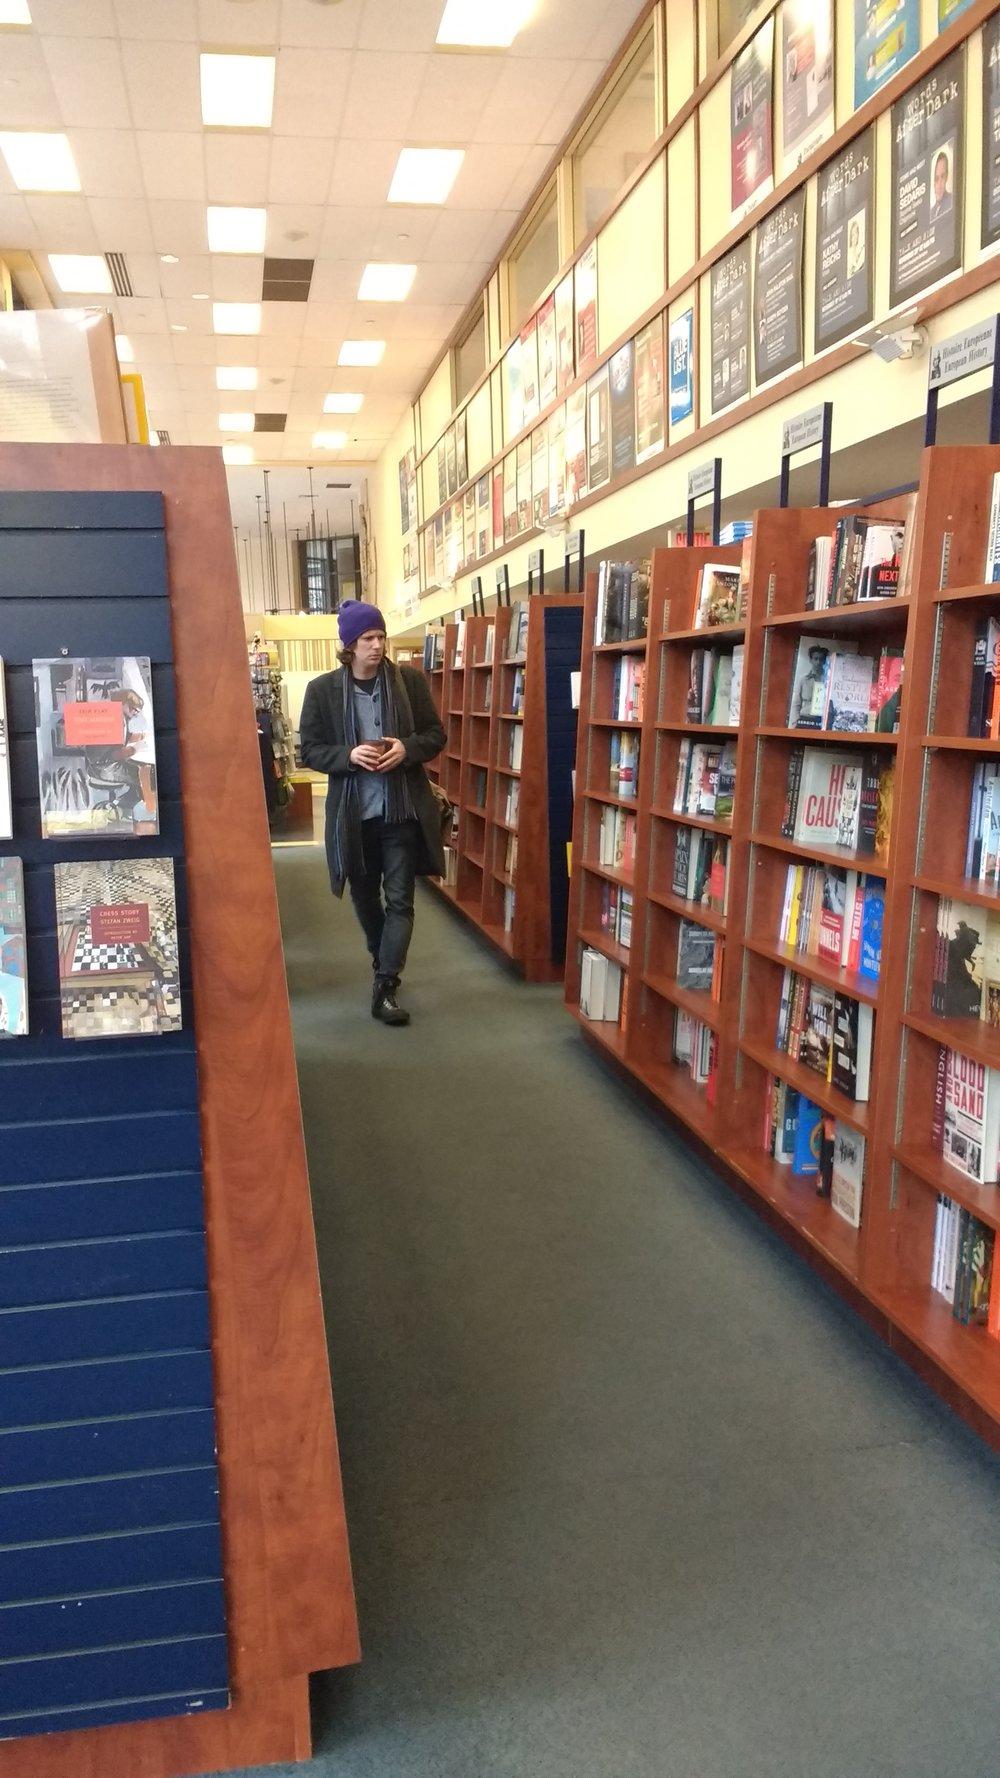 That bookshop